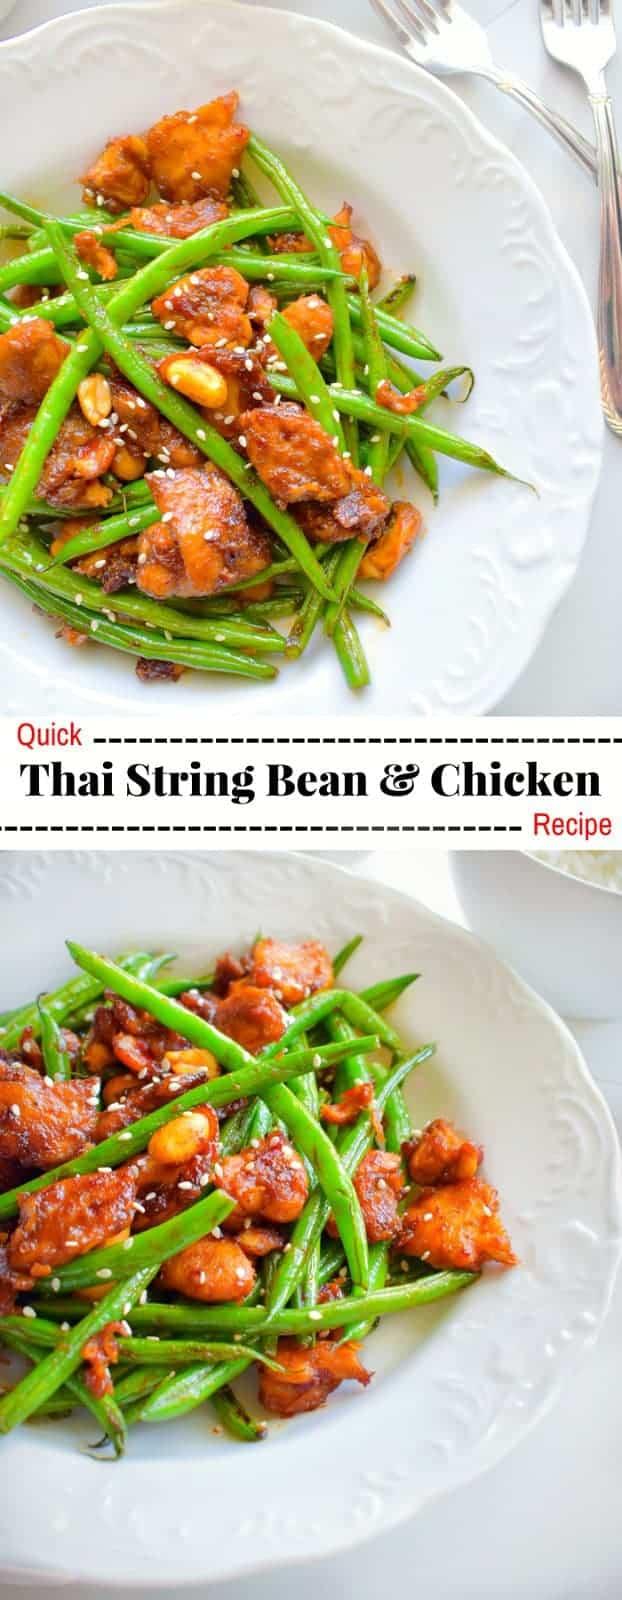 Quick Thai String Bean & ChickenRecipe : #thai #chicken #stringbeans